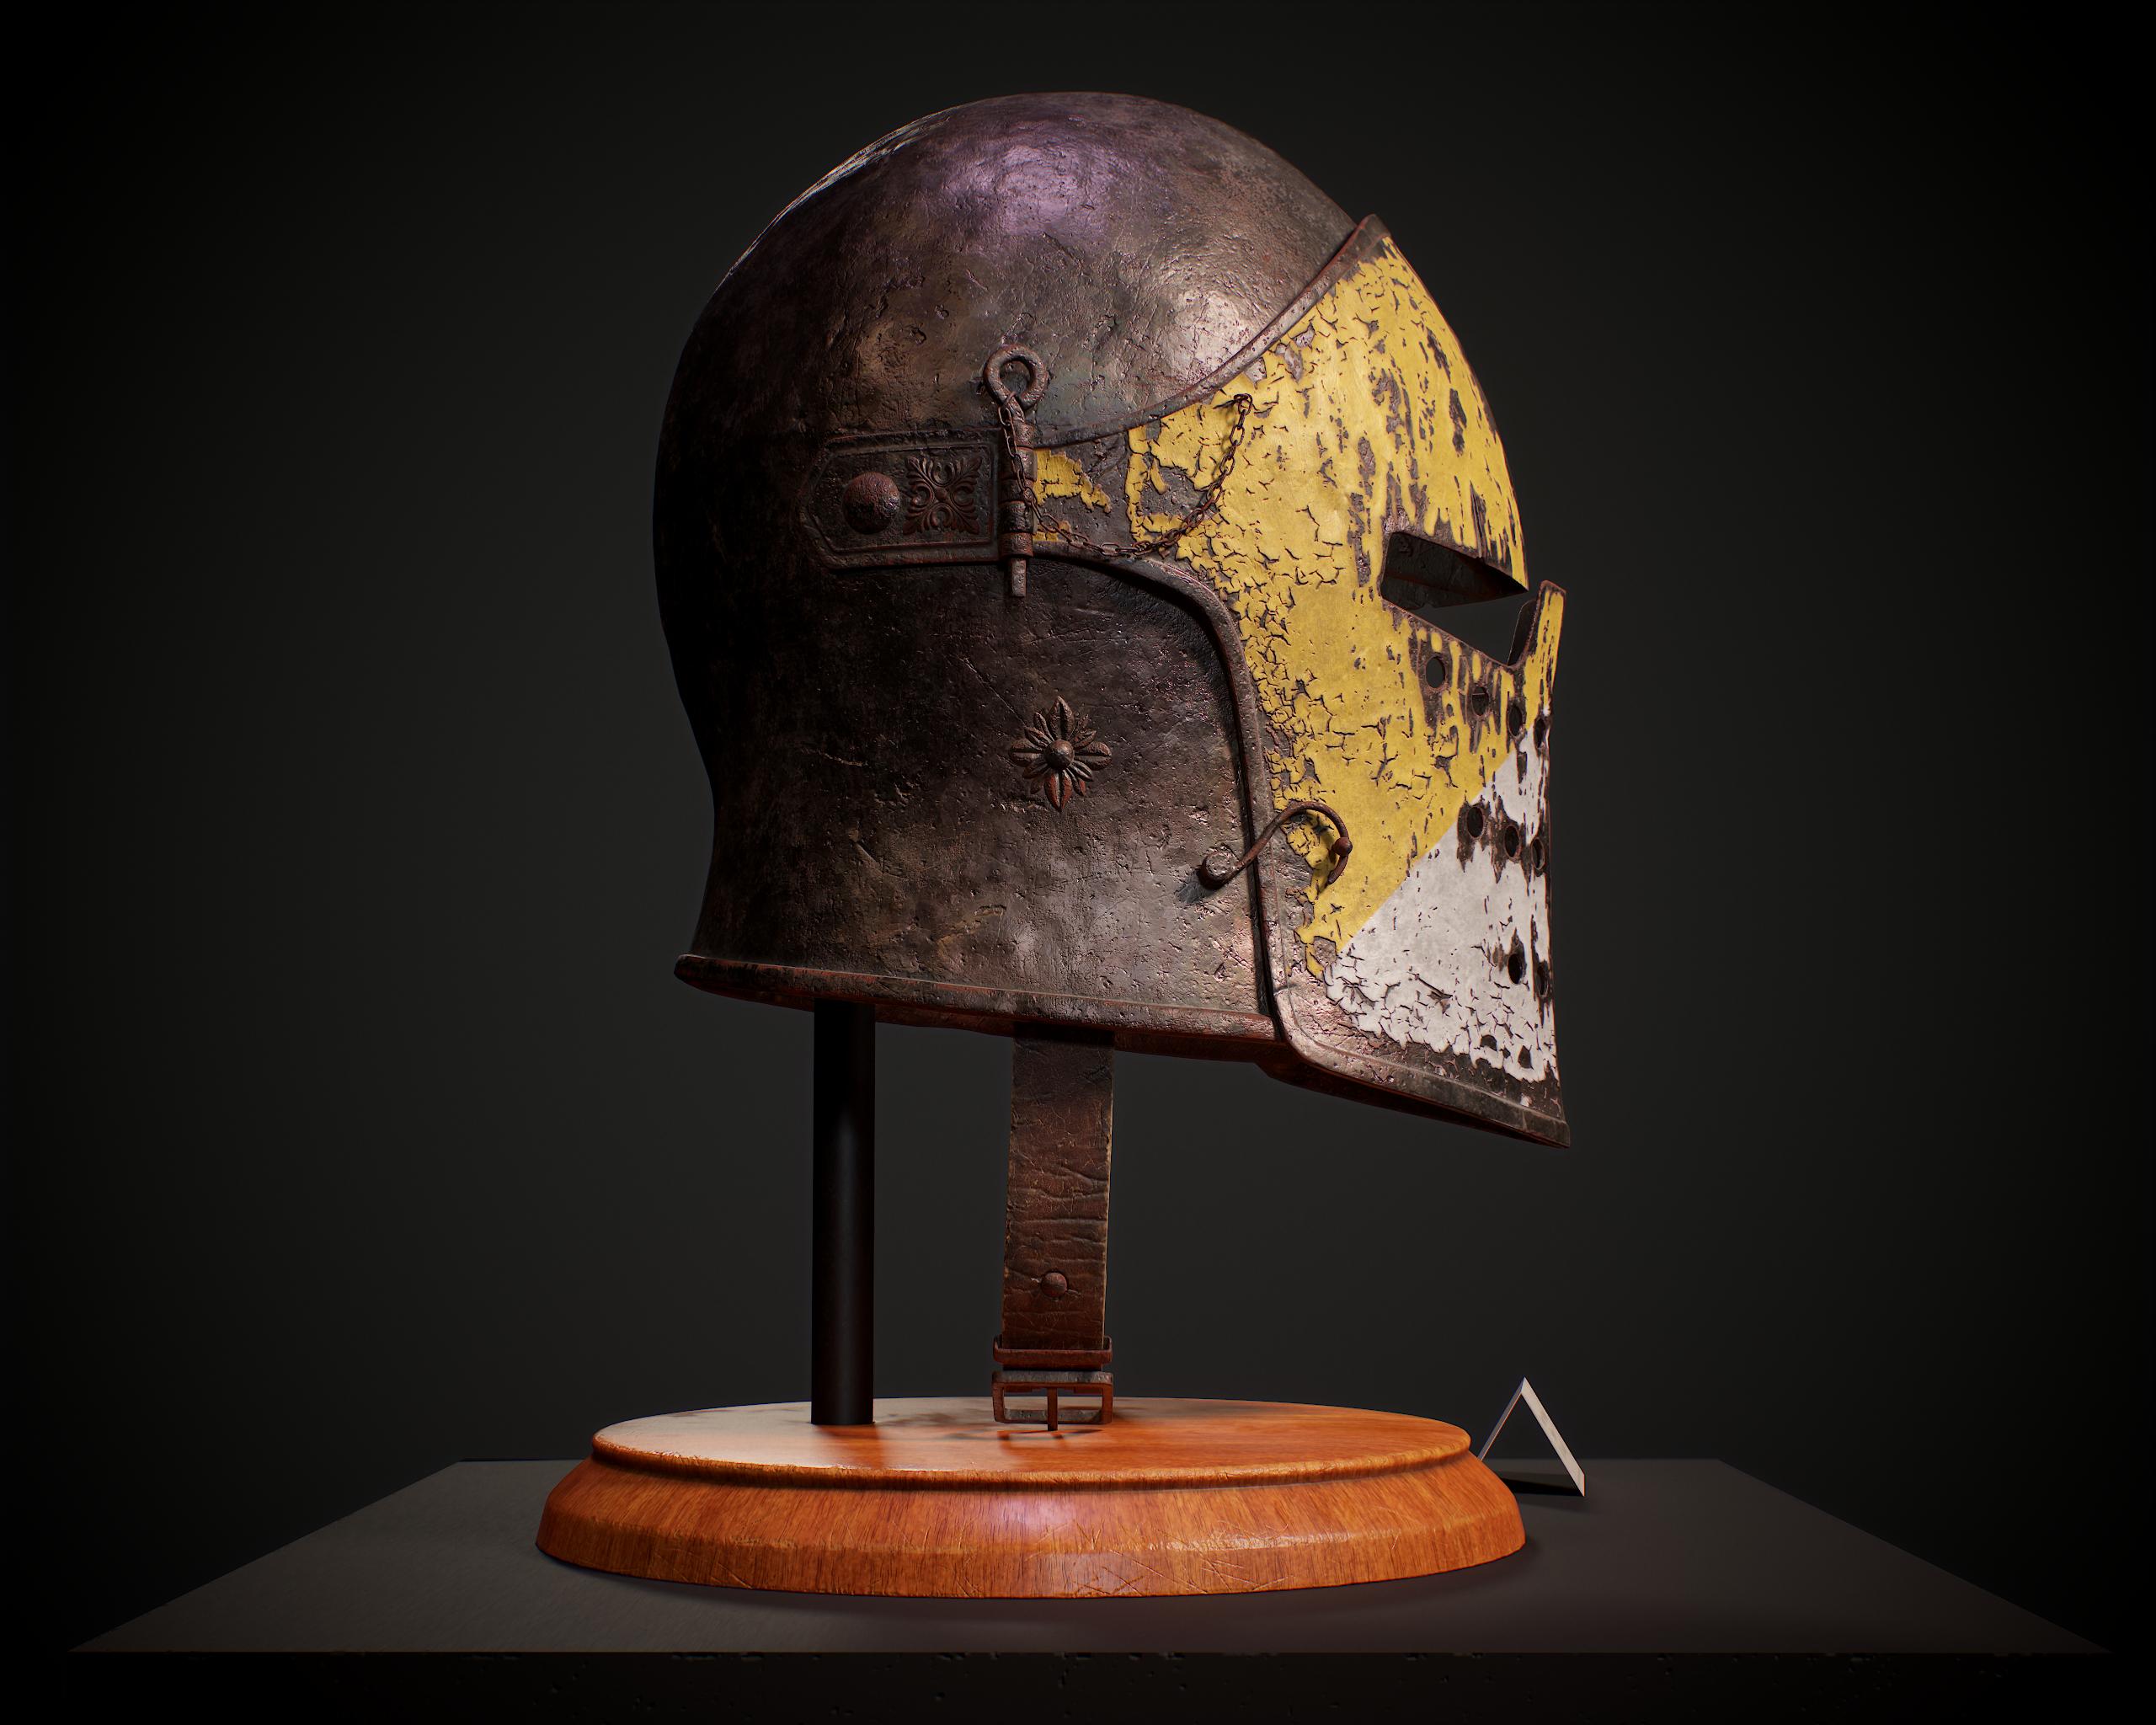 Helmet_4